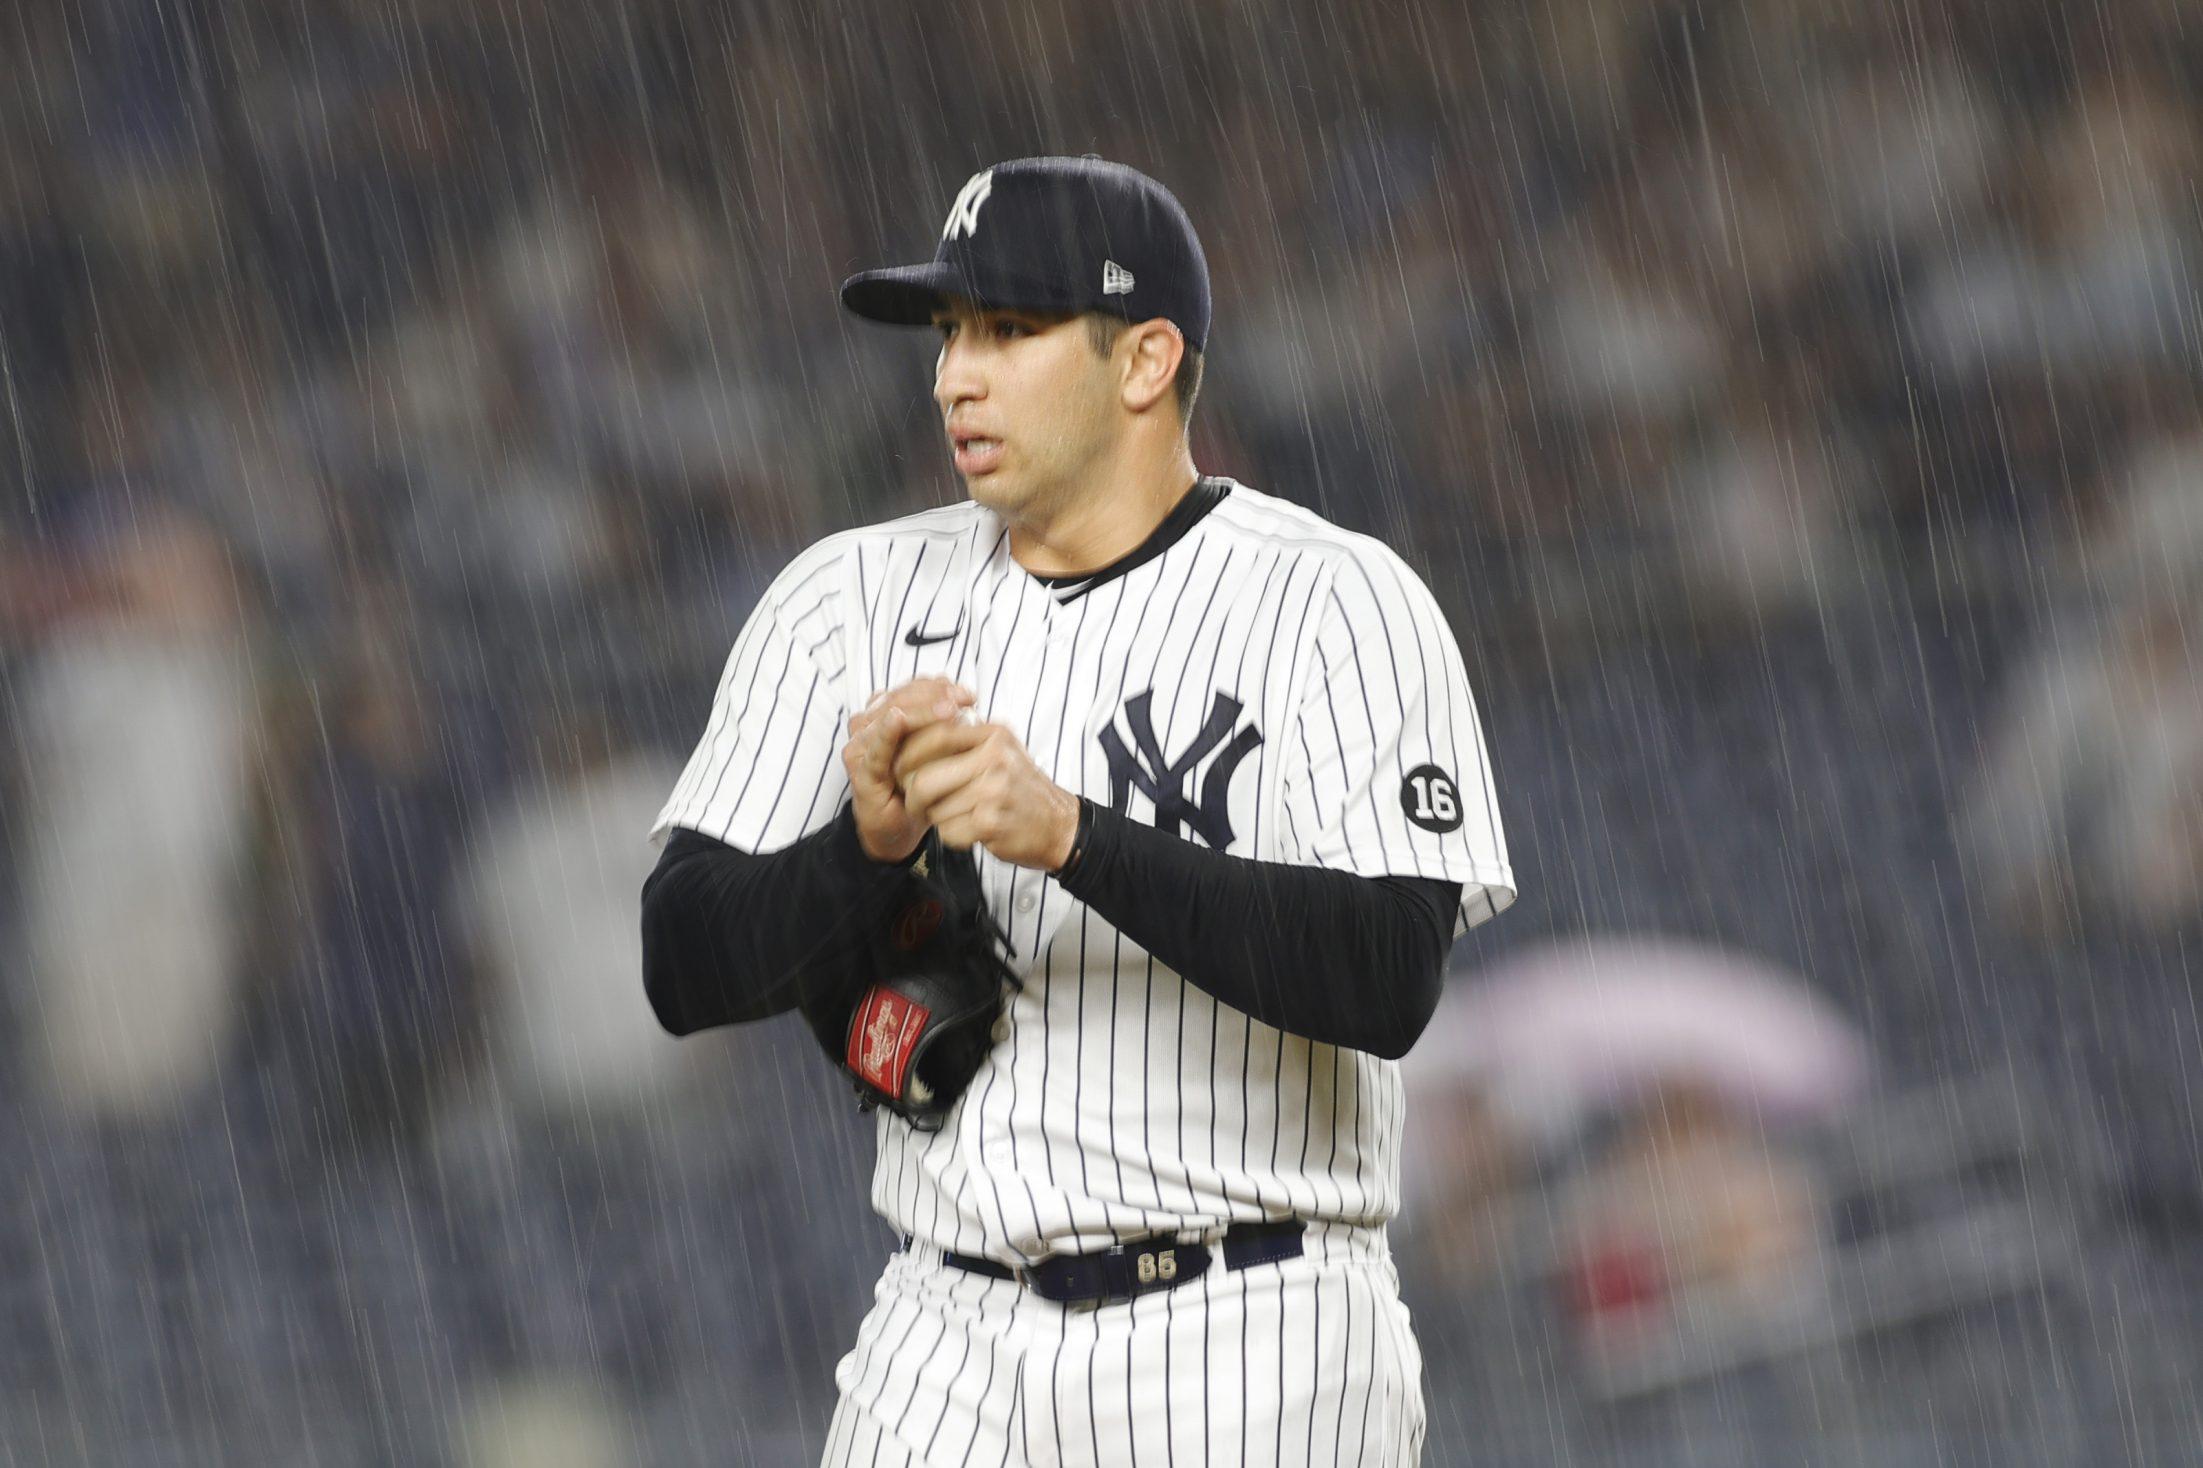 Luis Cessa pitches in the rain